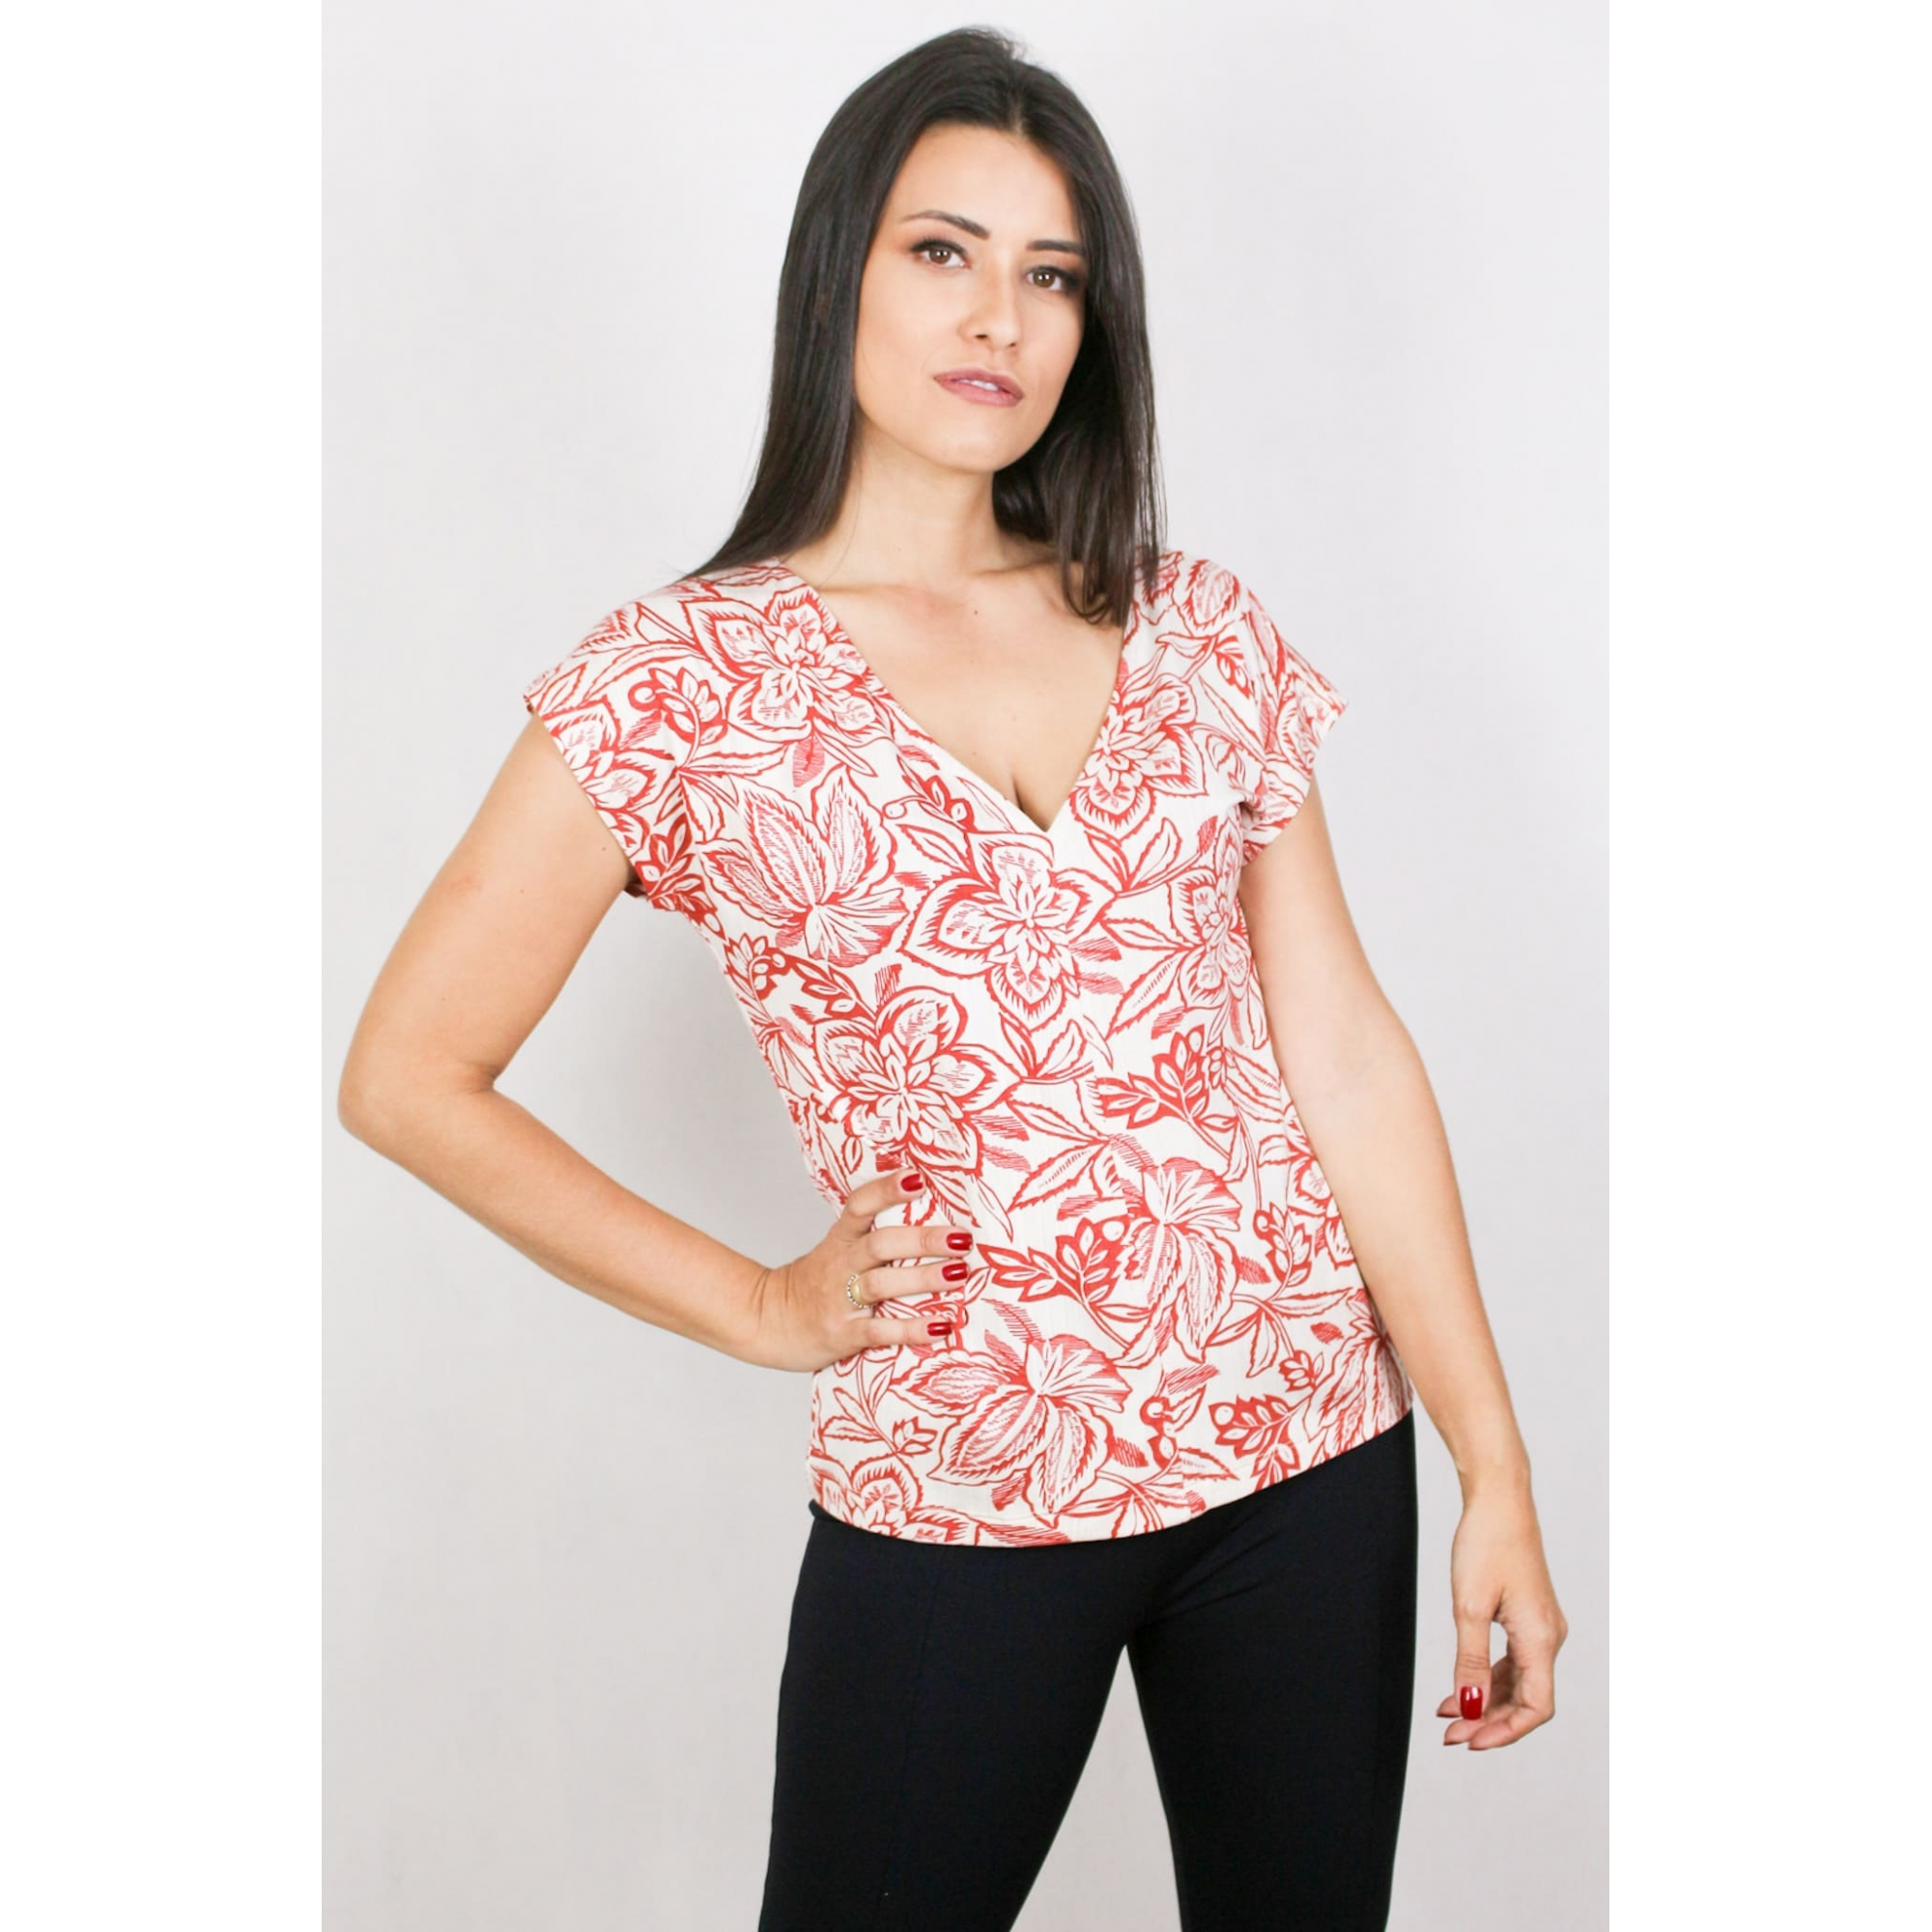 Blusa Feminina Estampada Floral